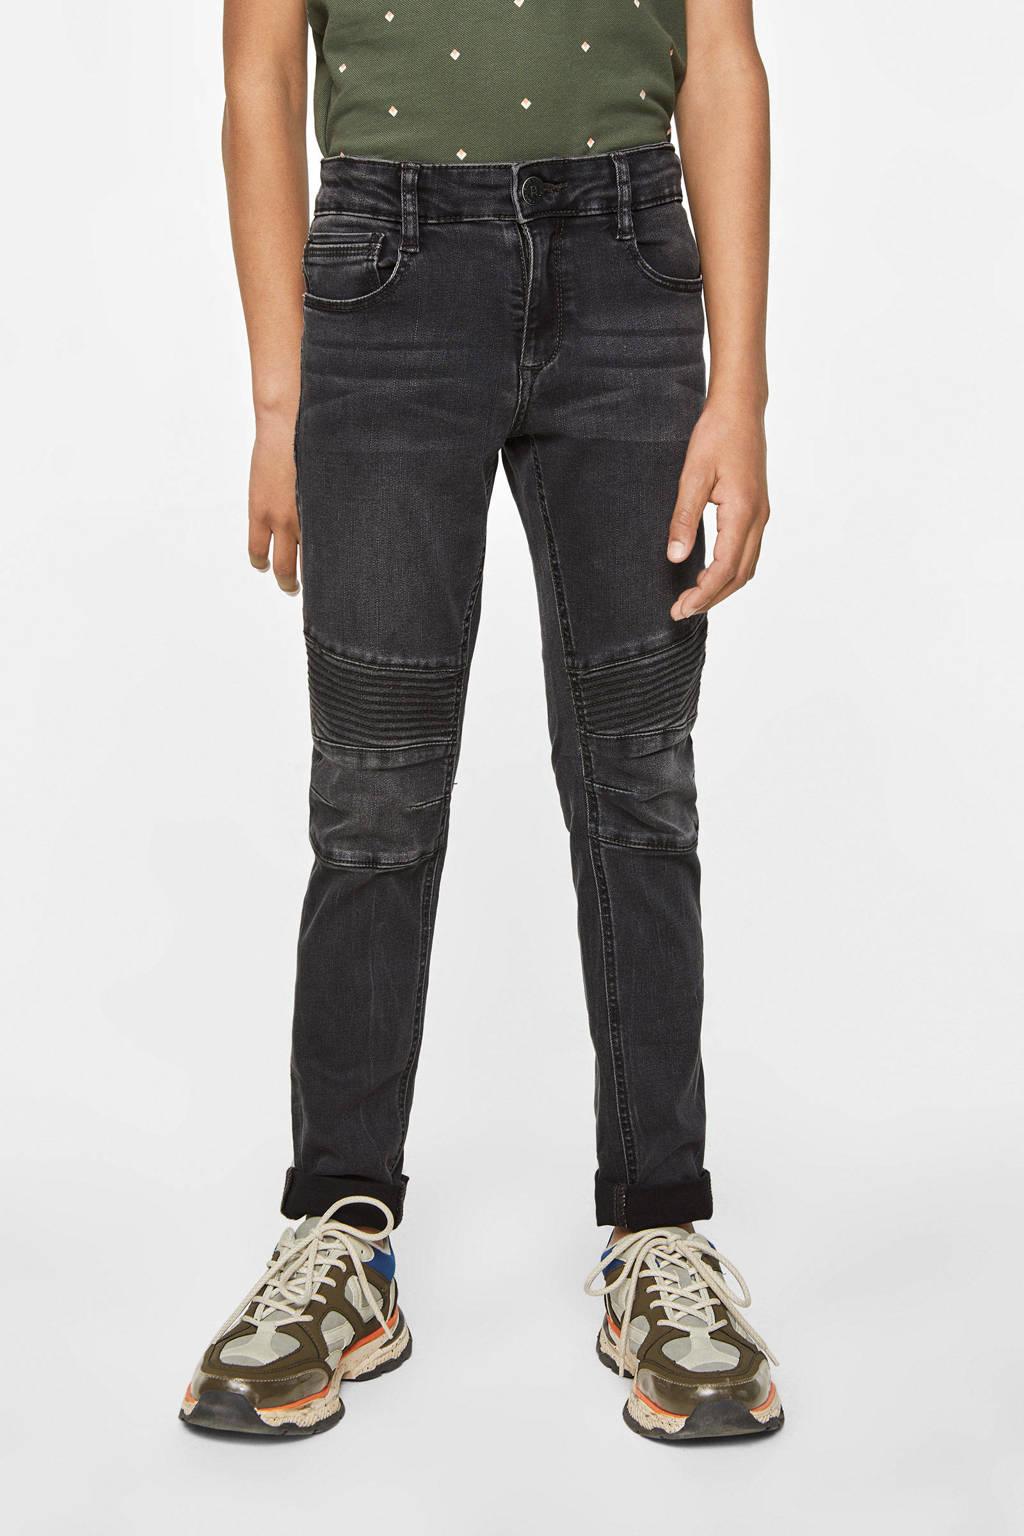 WE Fashion Blue Ridge super skinny jeans grijs, Grijs